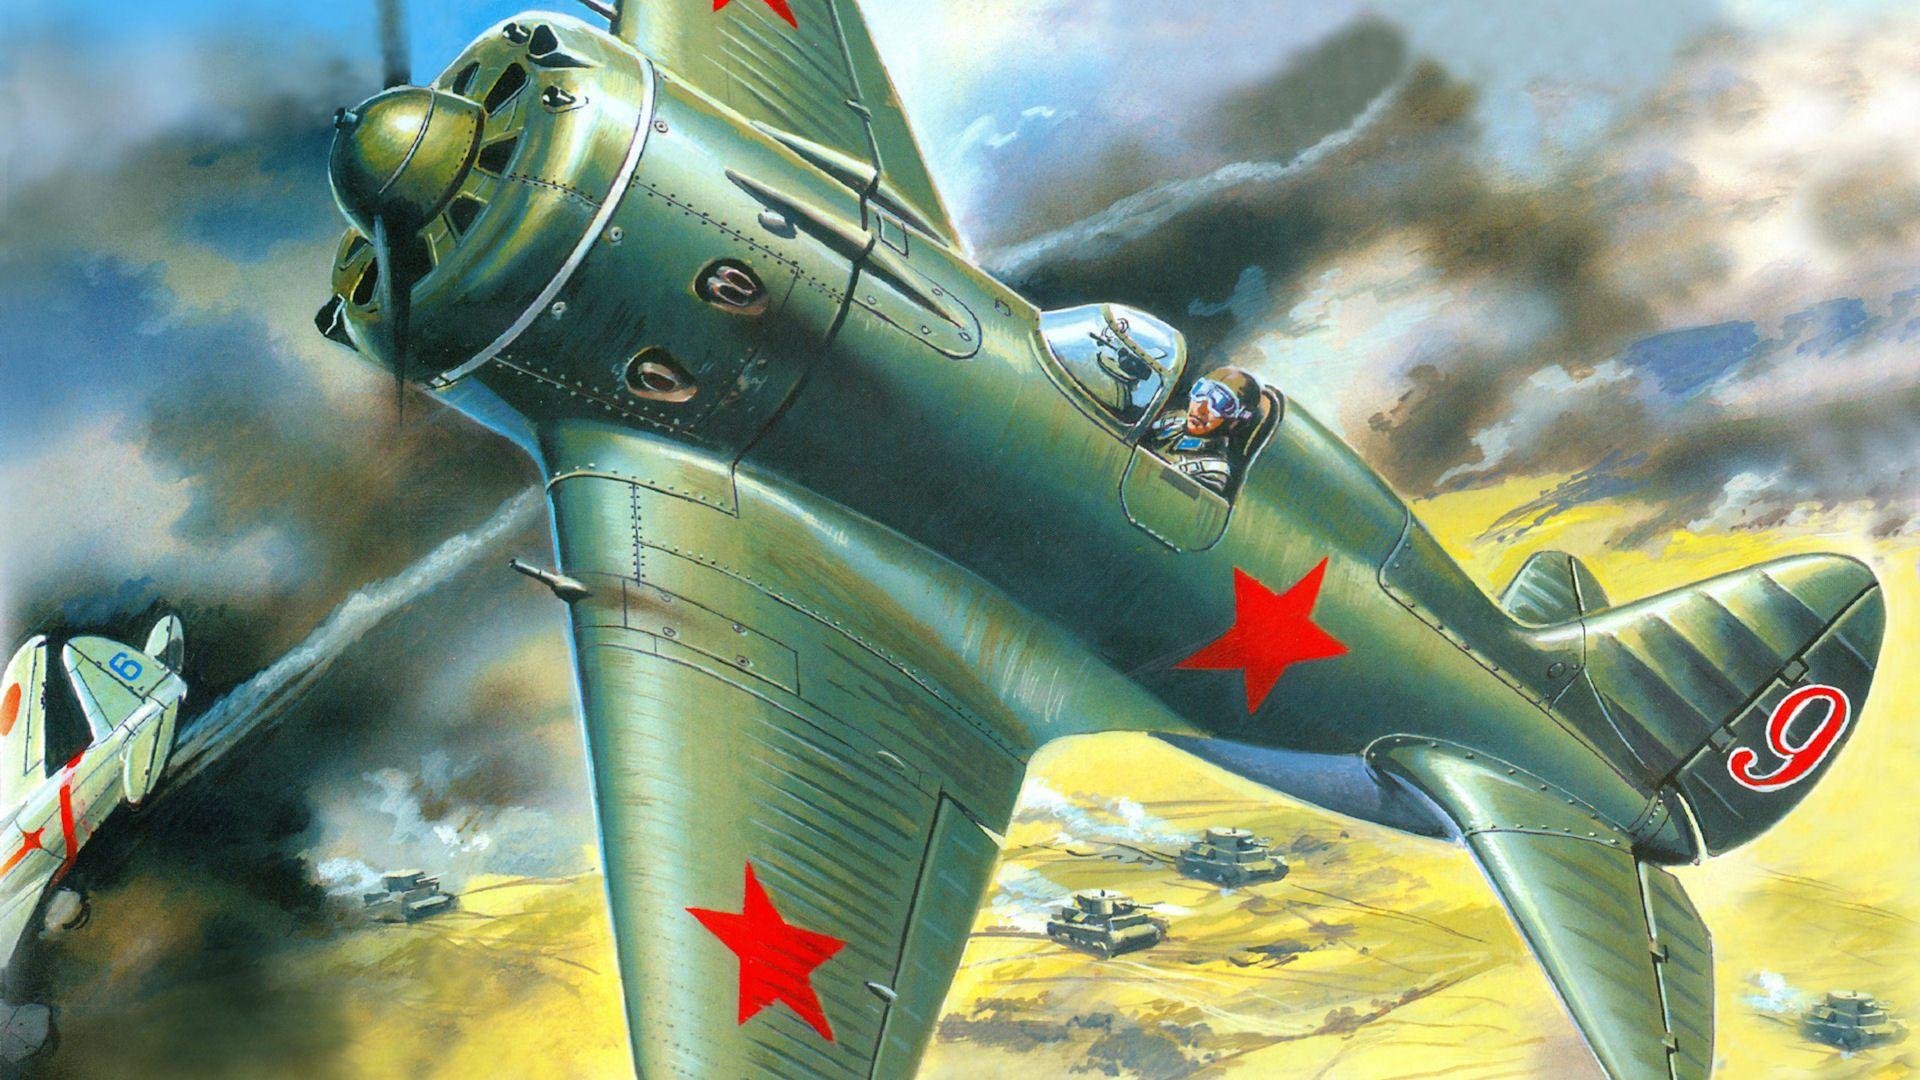 Картинки самолетов танков, телефон